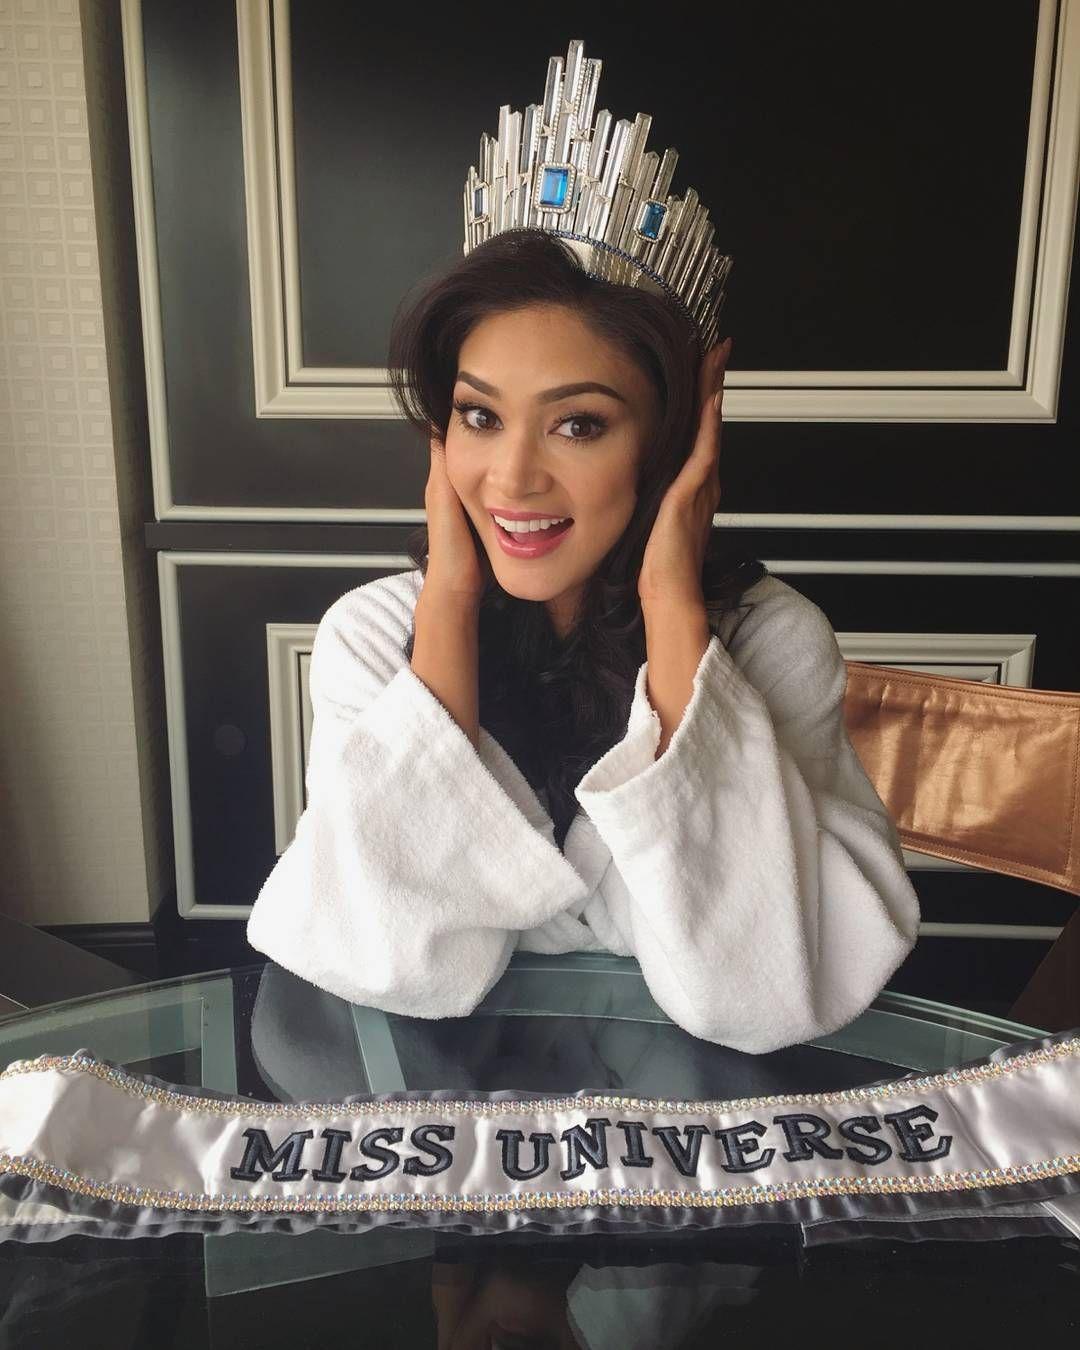 Miss Universo 2015 posa sorridente com sua coroa